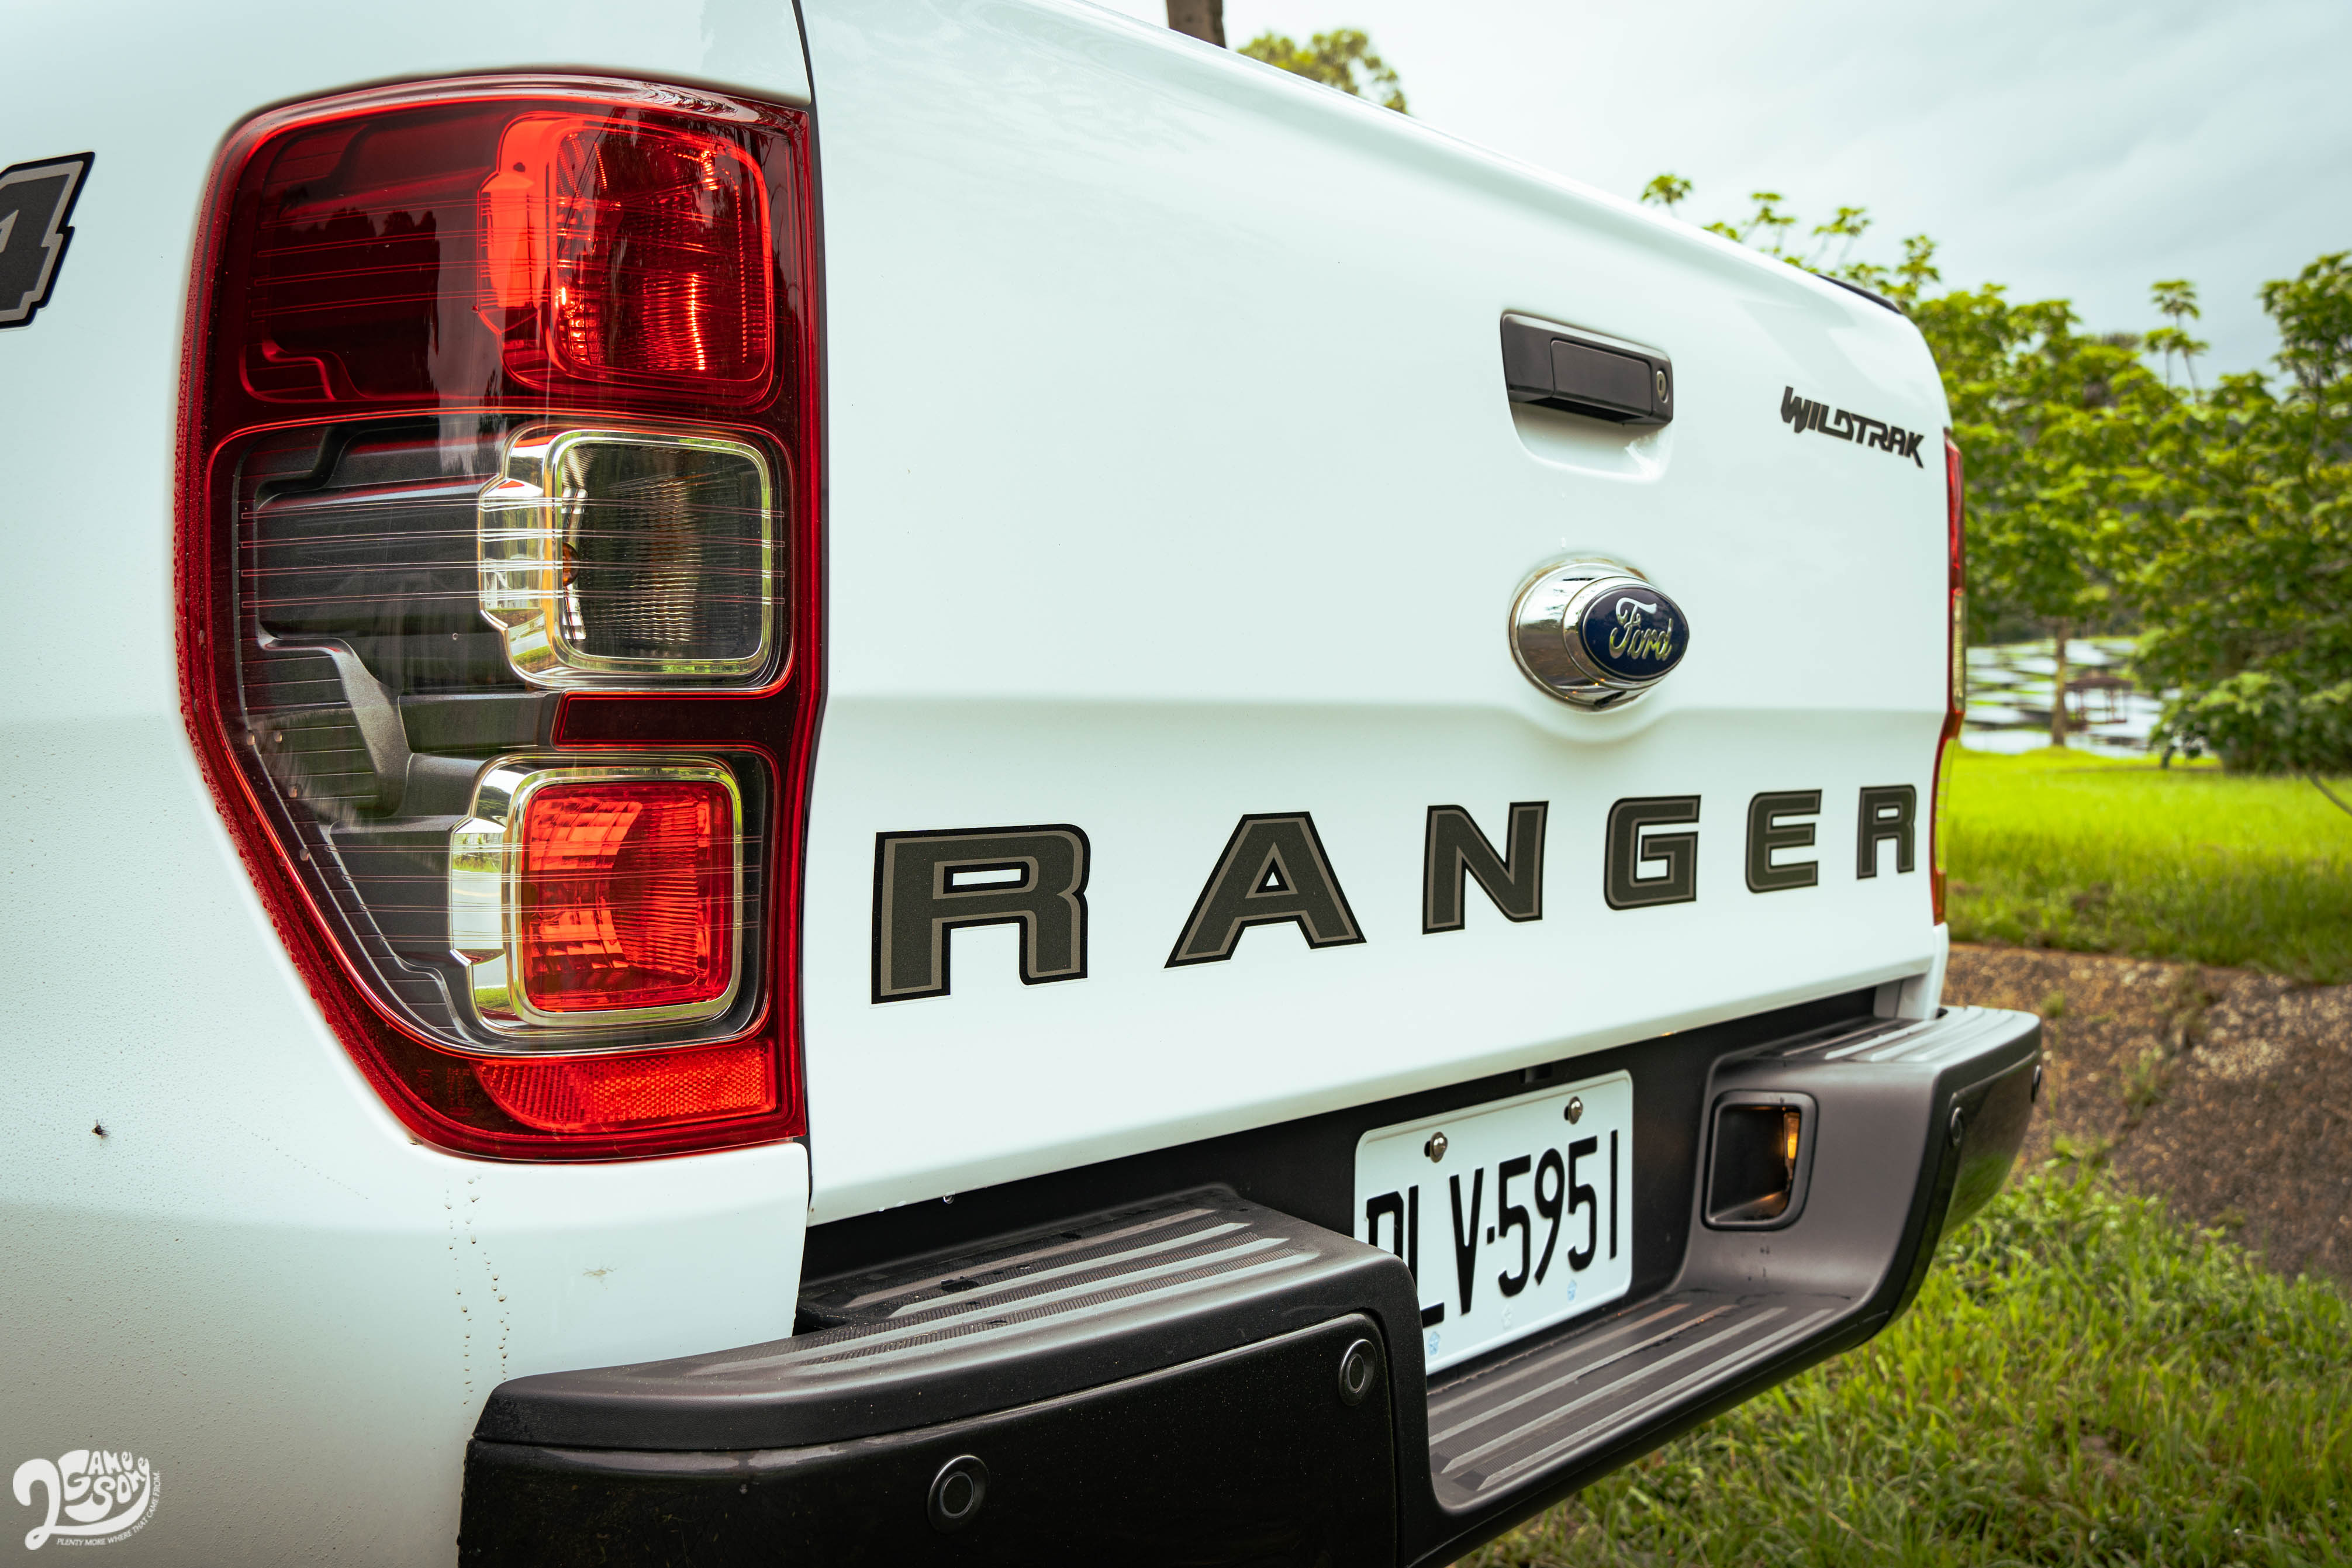 Ford Ranger 2021 年式由 104.8 萬的職人型、119.8 萬的全能型以及149.8 萬的運動型組成。